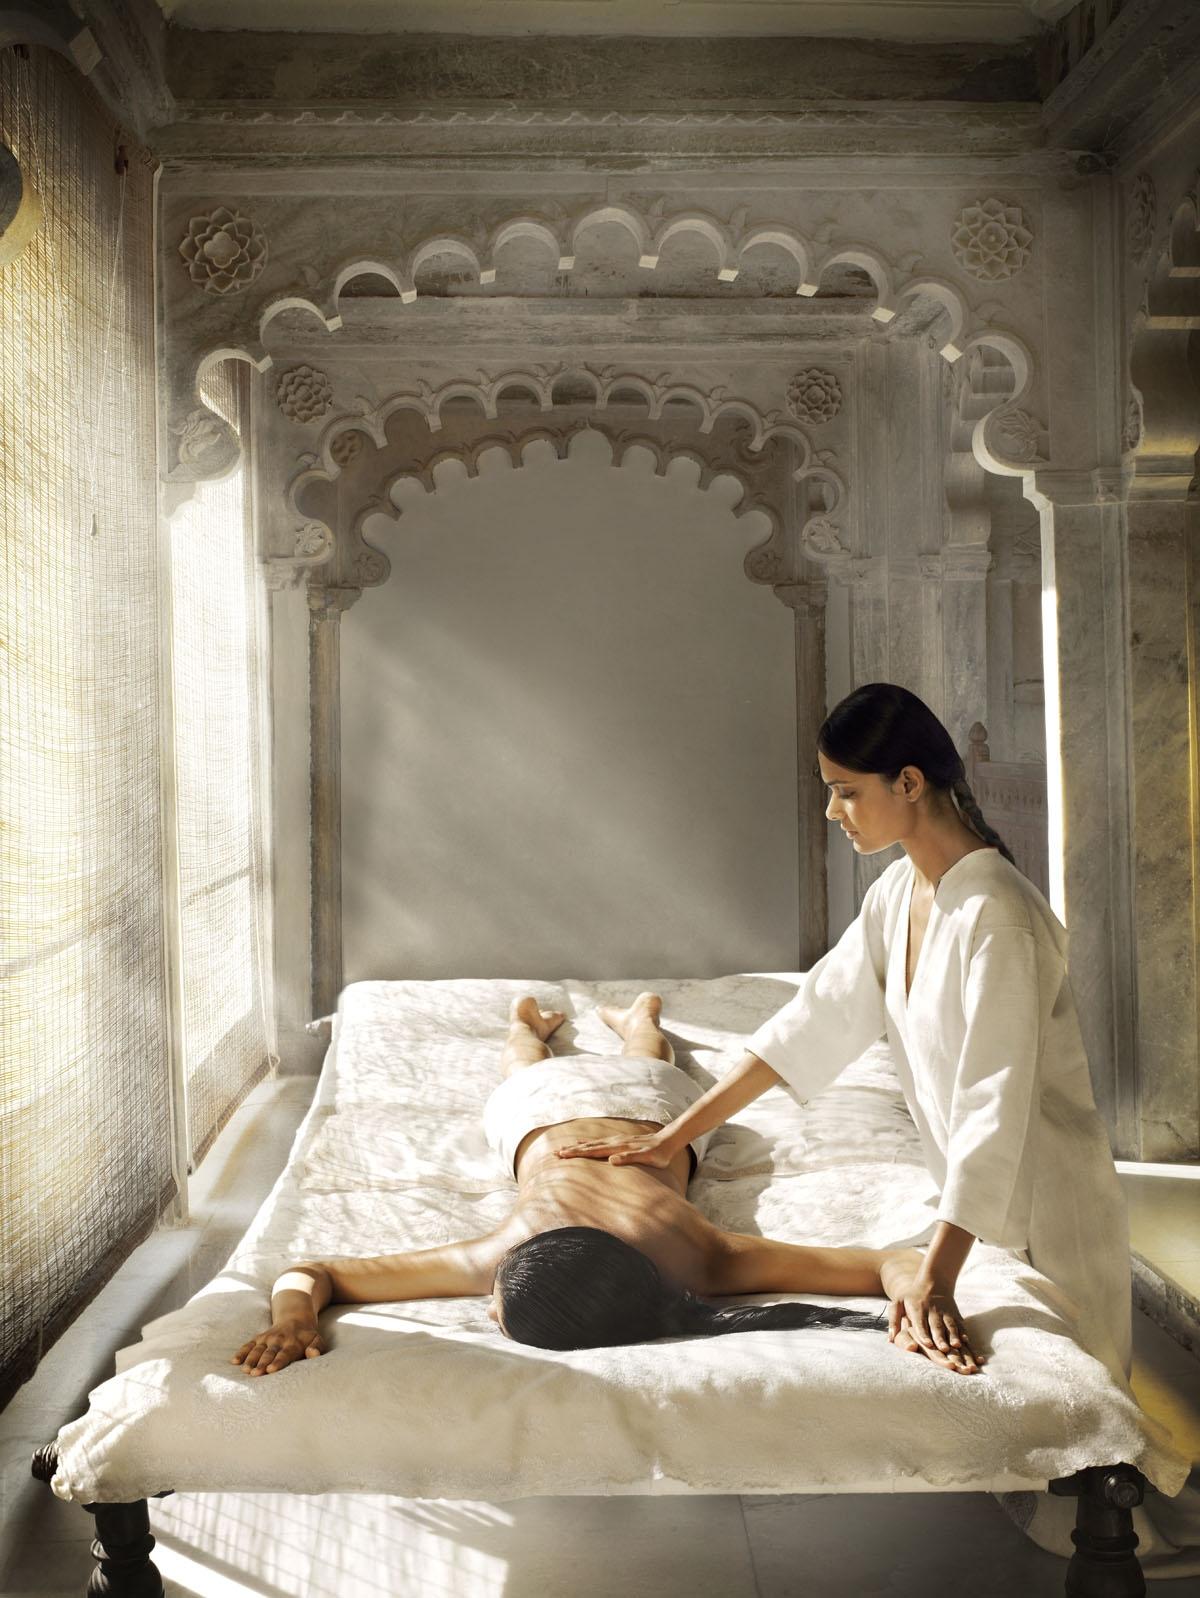 Body to body massagen düsseldorf